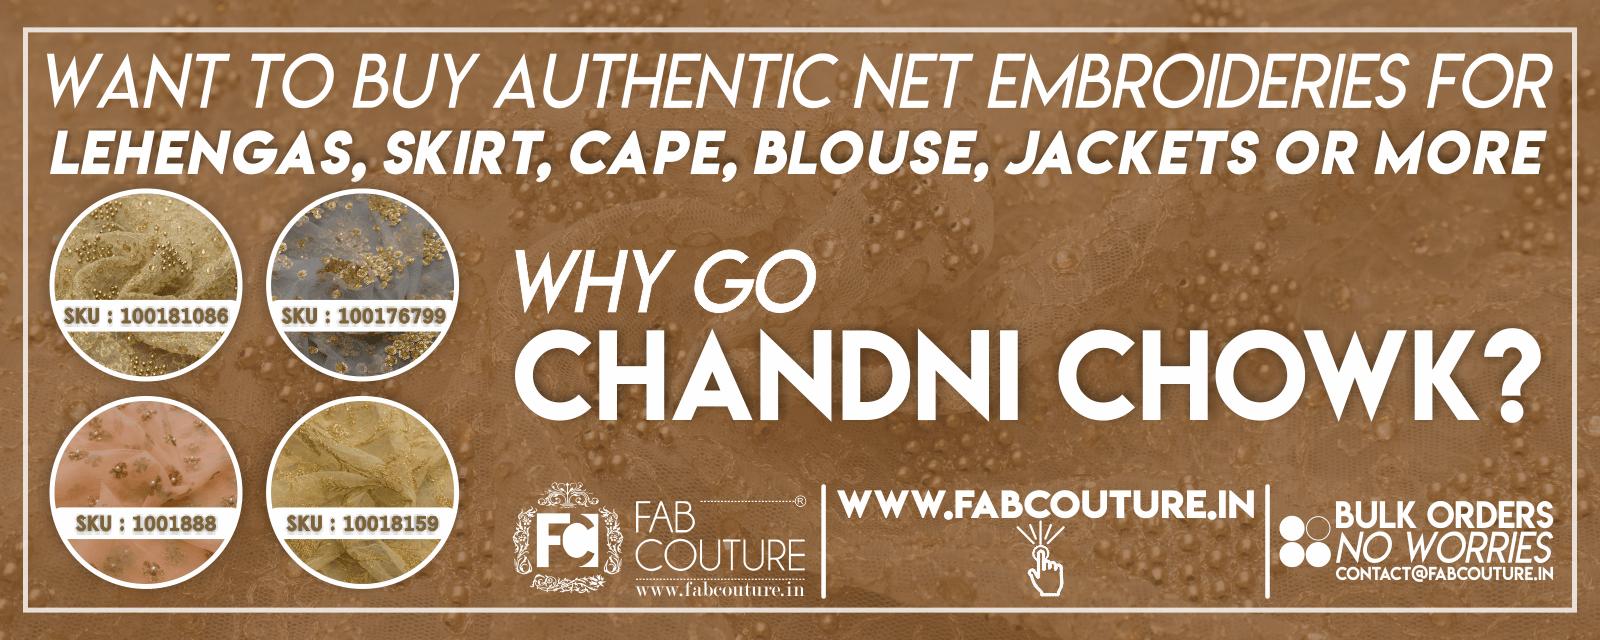 Why Go Chandni Chowk?